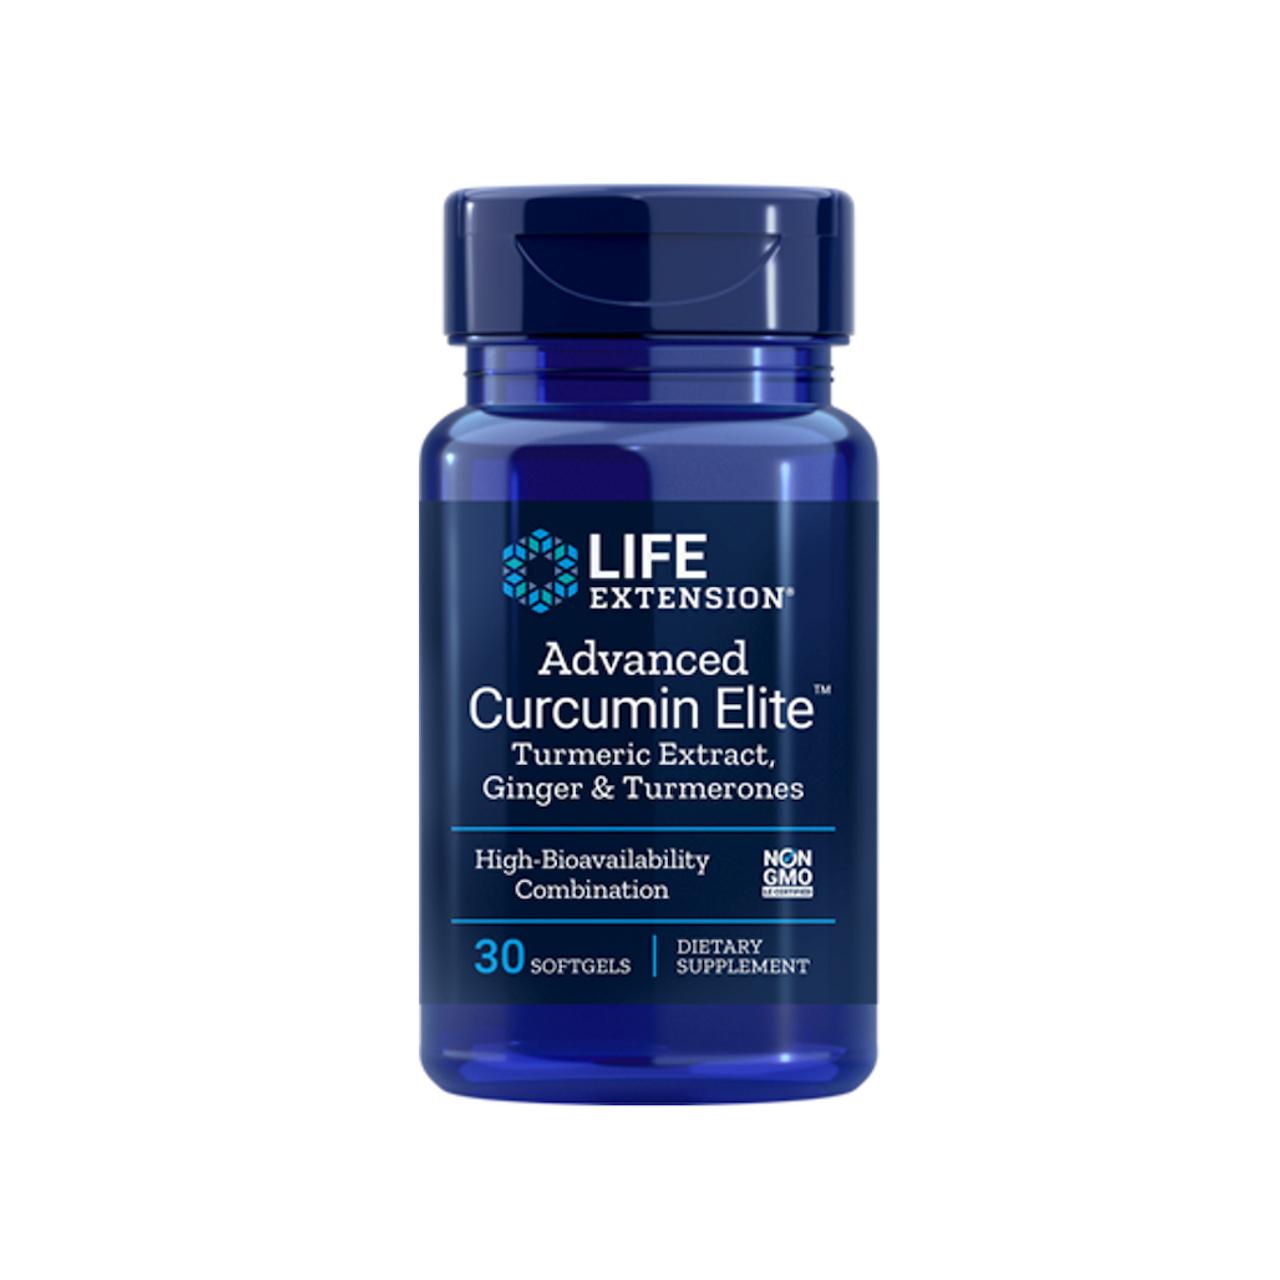 Advanced Curcumin Elite™ Turmeric Extract, Ginger & Turmerones-2324